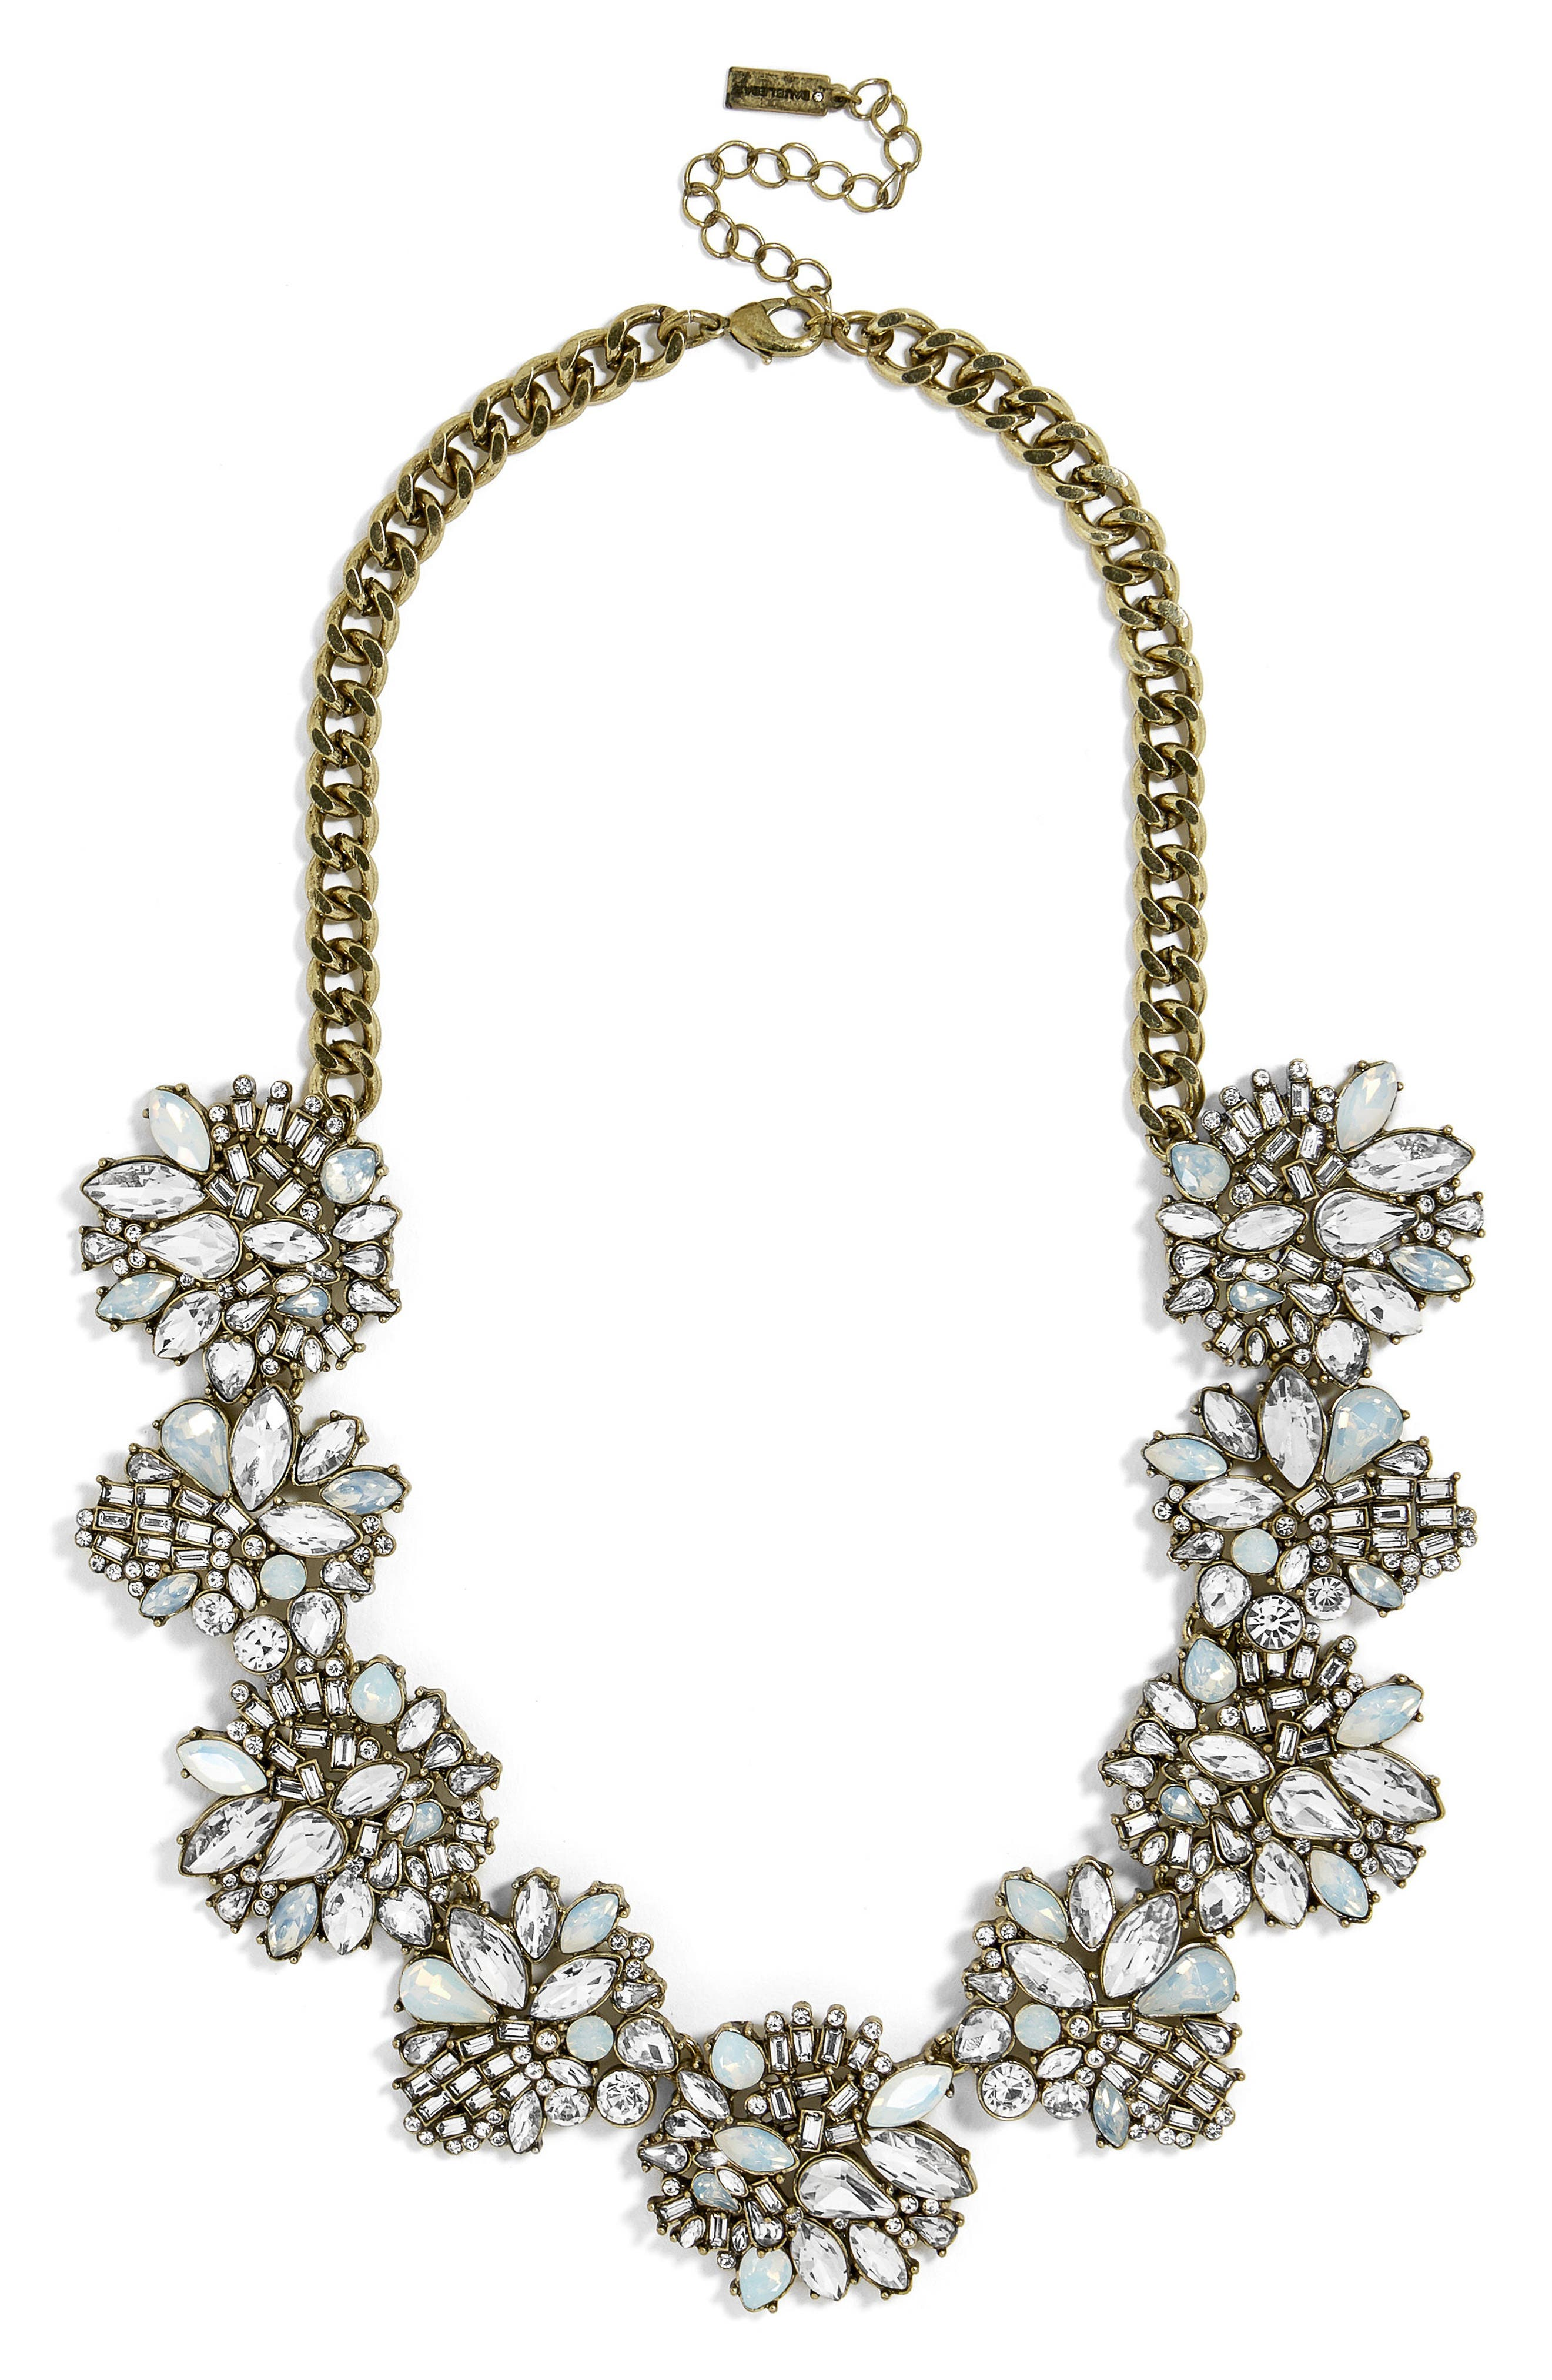 Alternate Image 1 Selected - BaubleBar Lissandra Crystal Statement Necklace